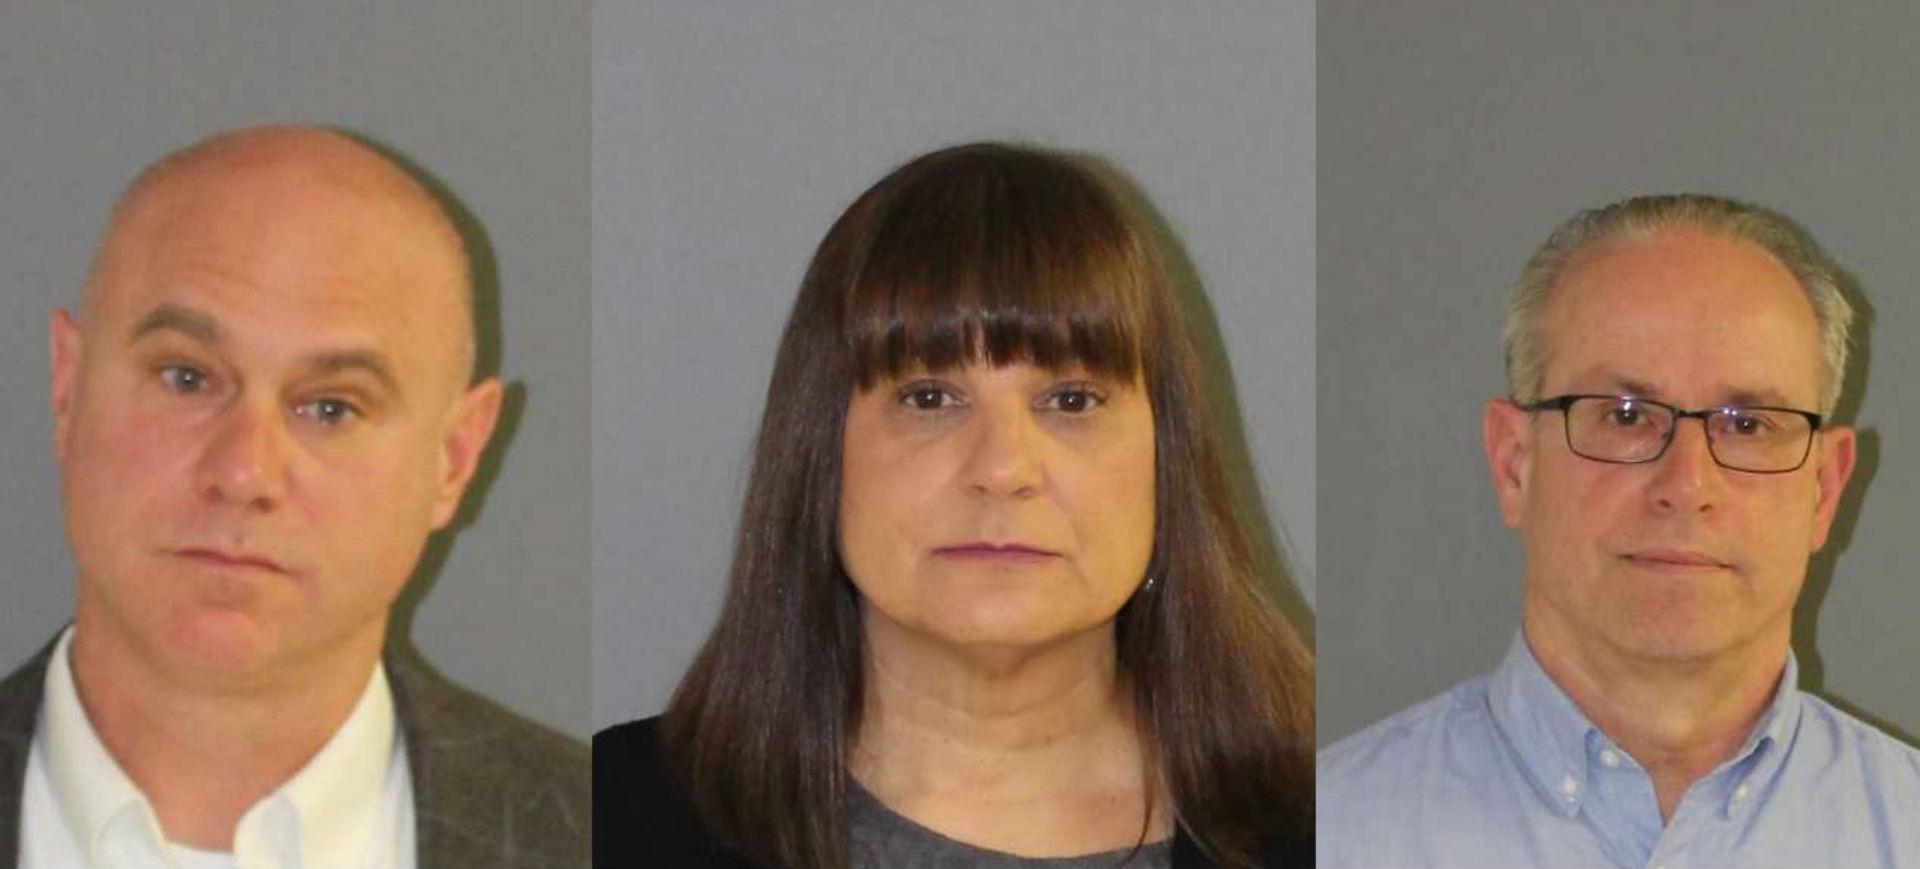 montville arrests_1524150759970.jpg.jpg